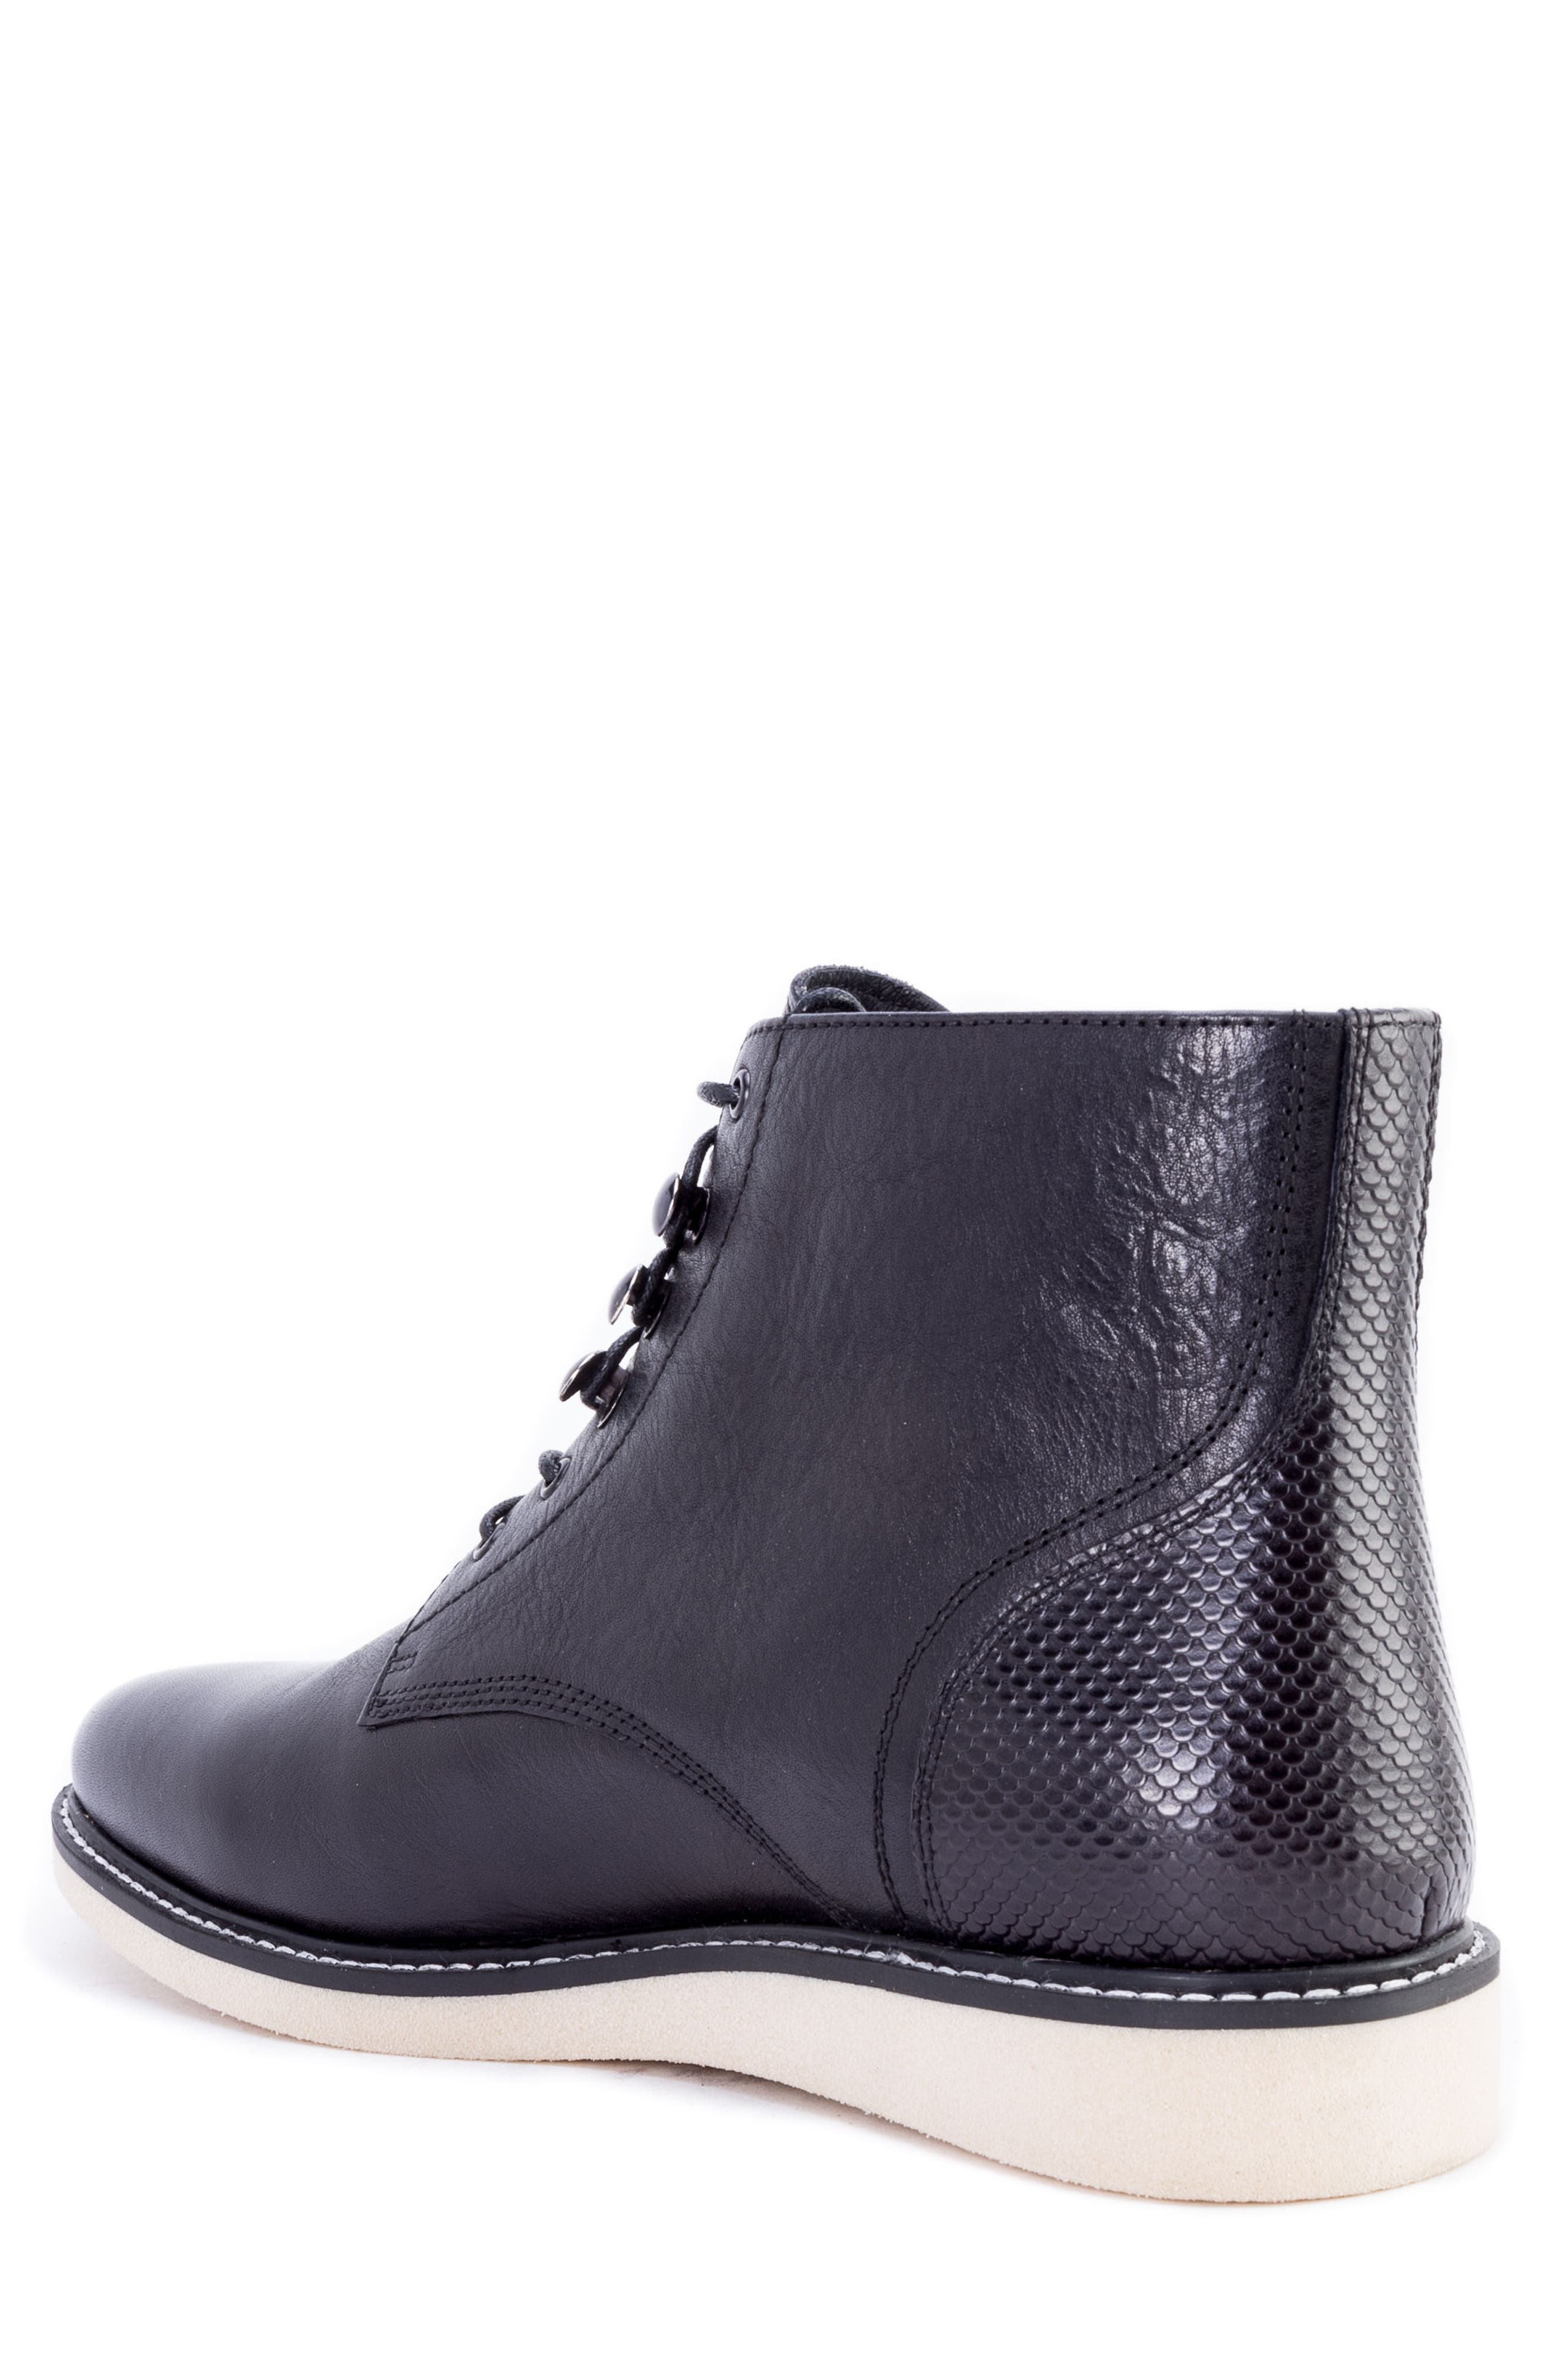 Finch Plain Toe Boot,                             Alternate thumbnail 2, color,                             BLACK LEATHER